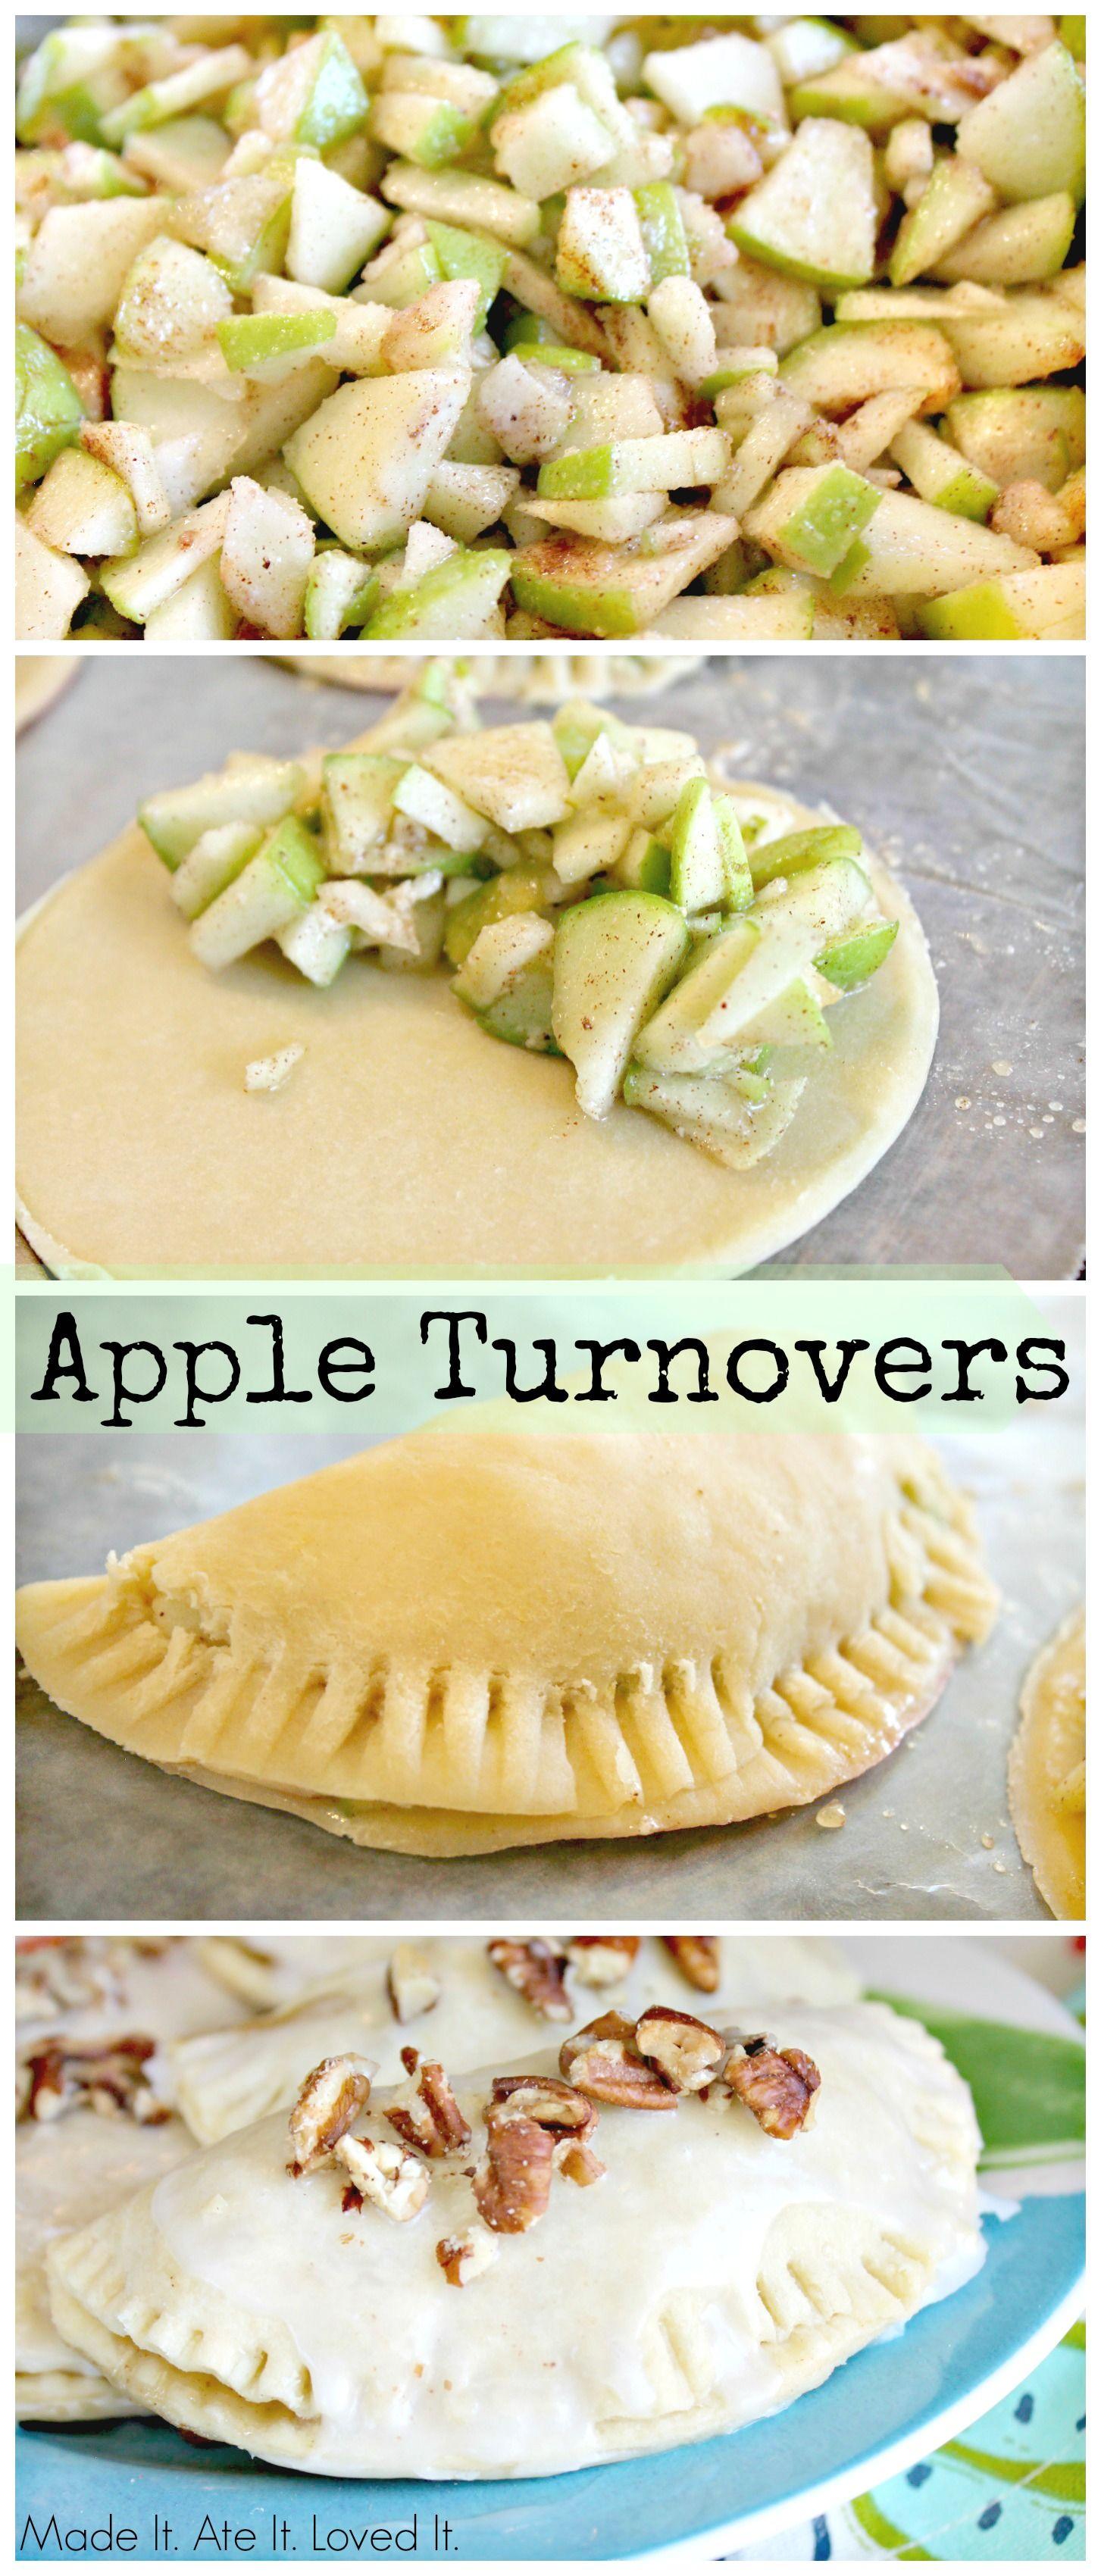 apple turnovers   Apple turnovers, Desserts, Sweet recipes